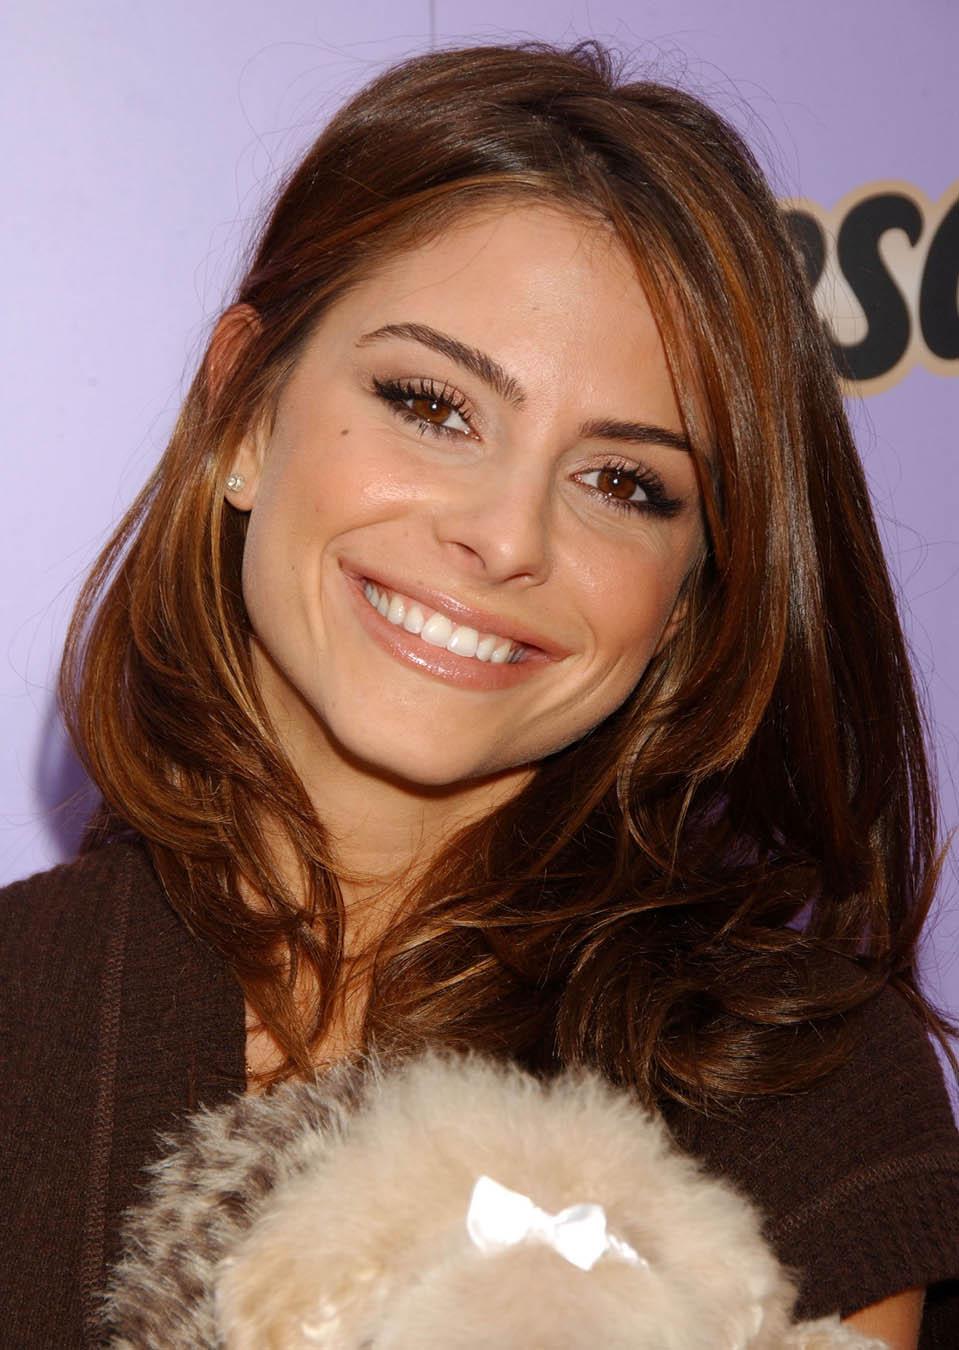 A New Life Hartz Maria Menounos Hairstyles 2012